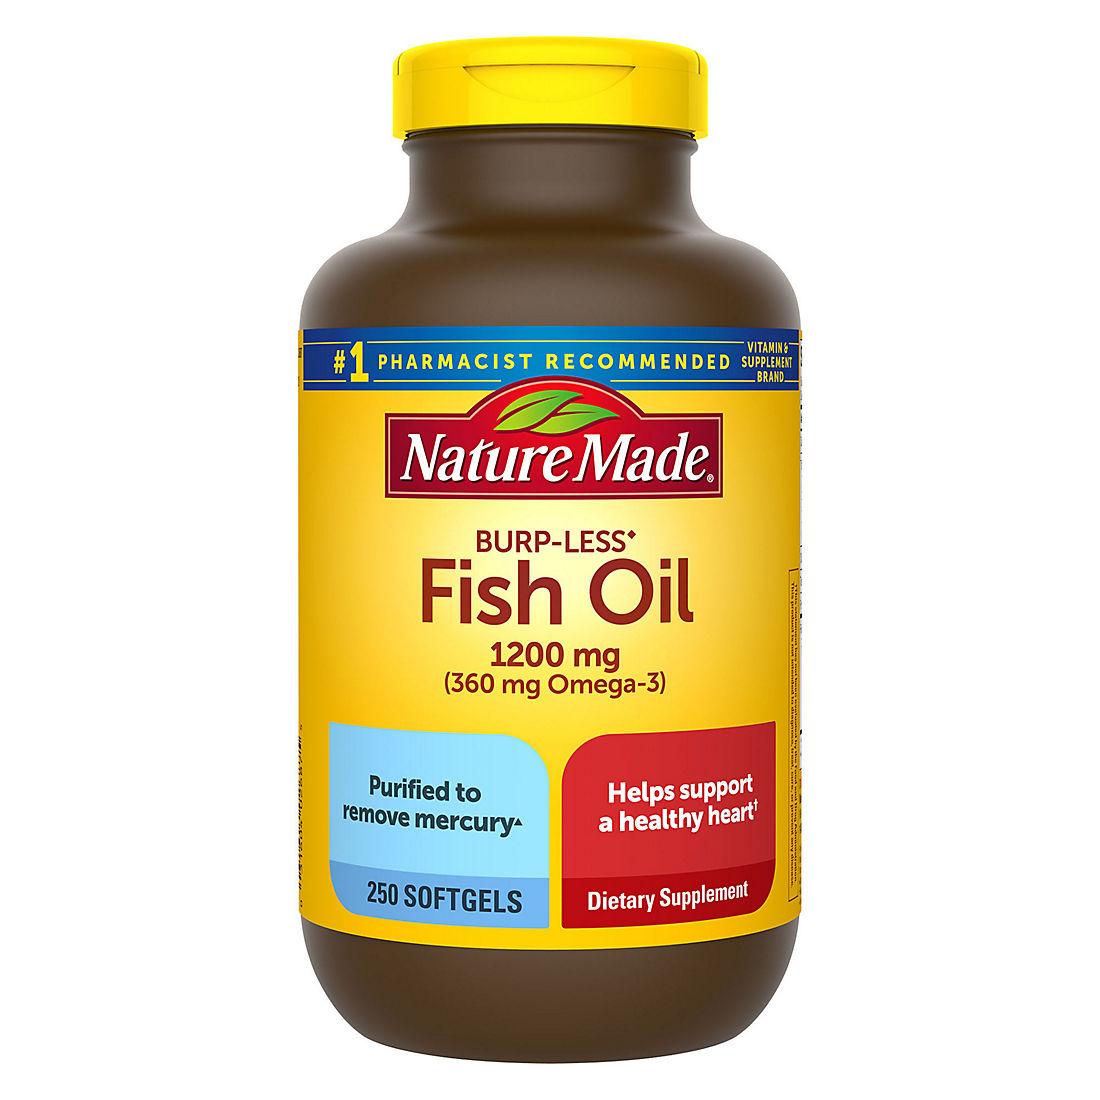 Nature Made 1200mg Odorless Fish Oil Softgels W 360mg Omega 3